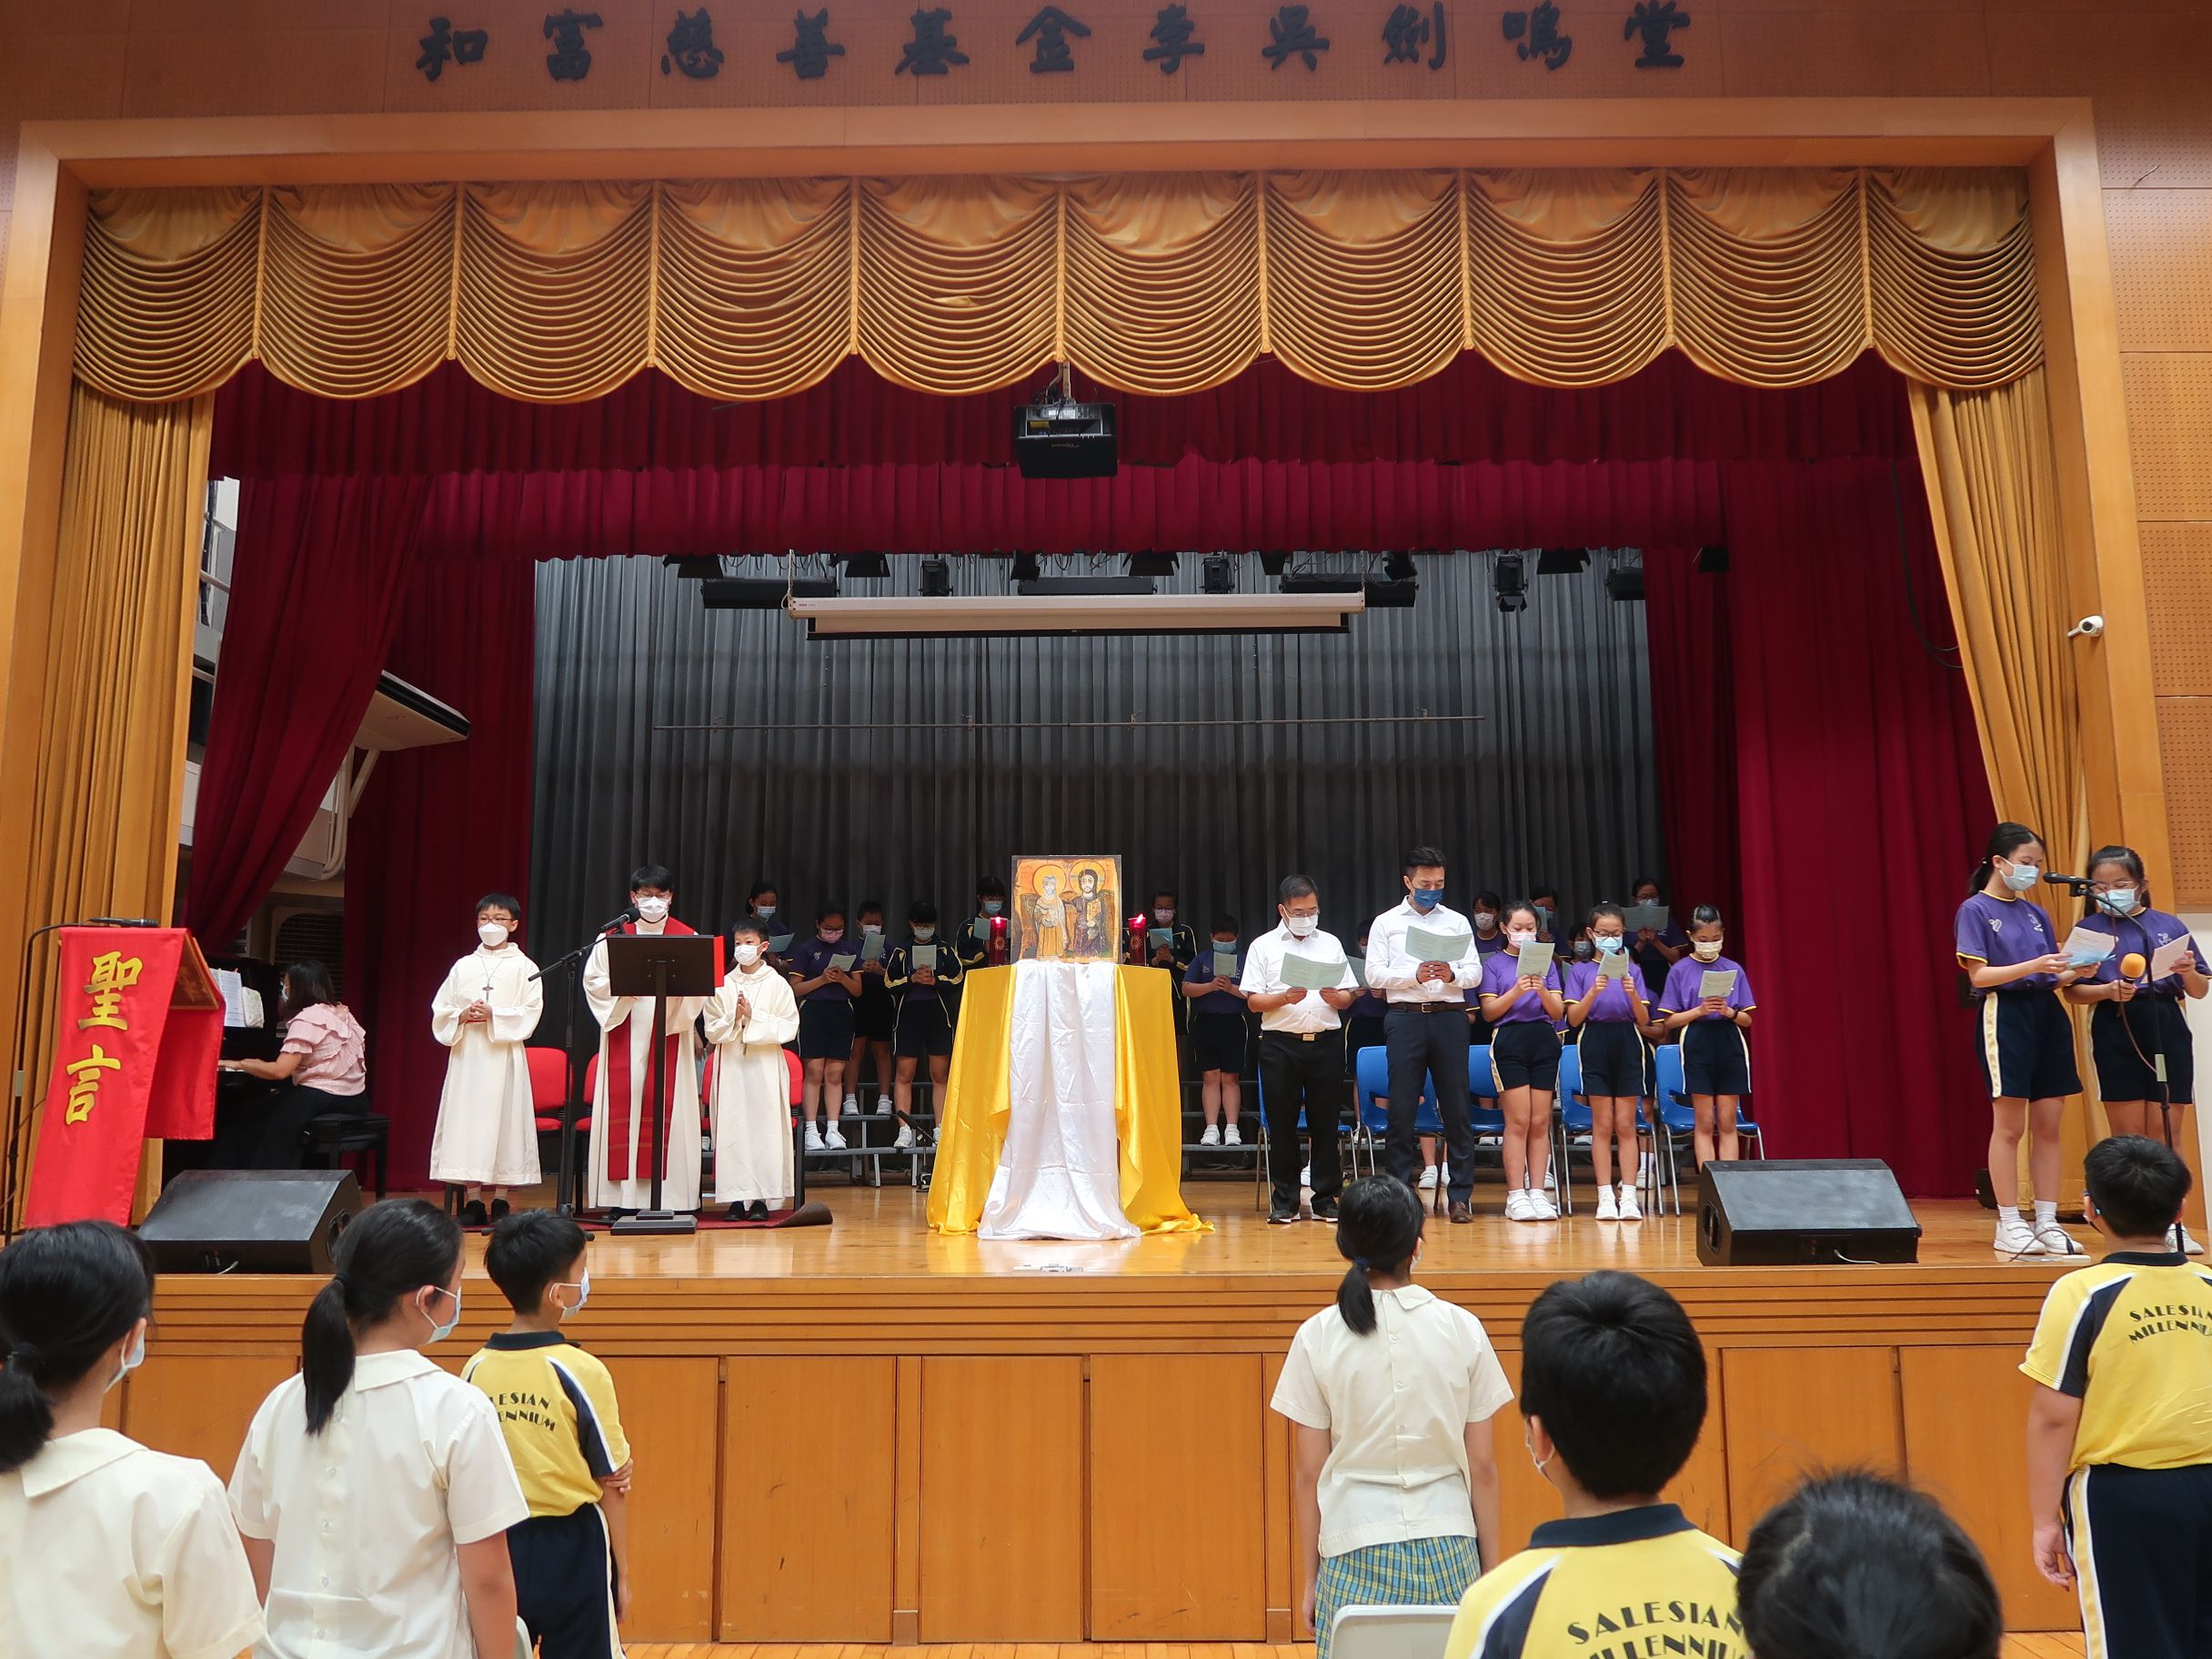 https://syh.edu.hk/sites/default/files/img_7612_1.jpg